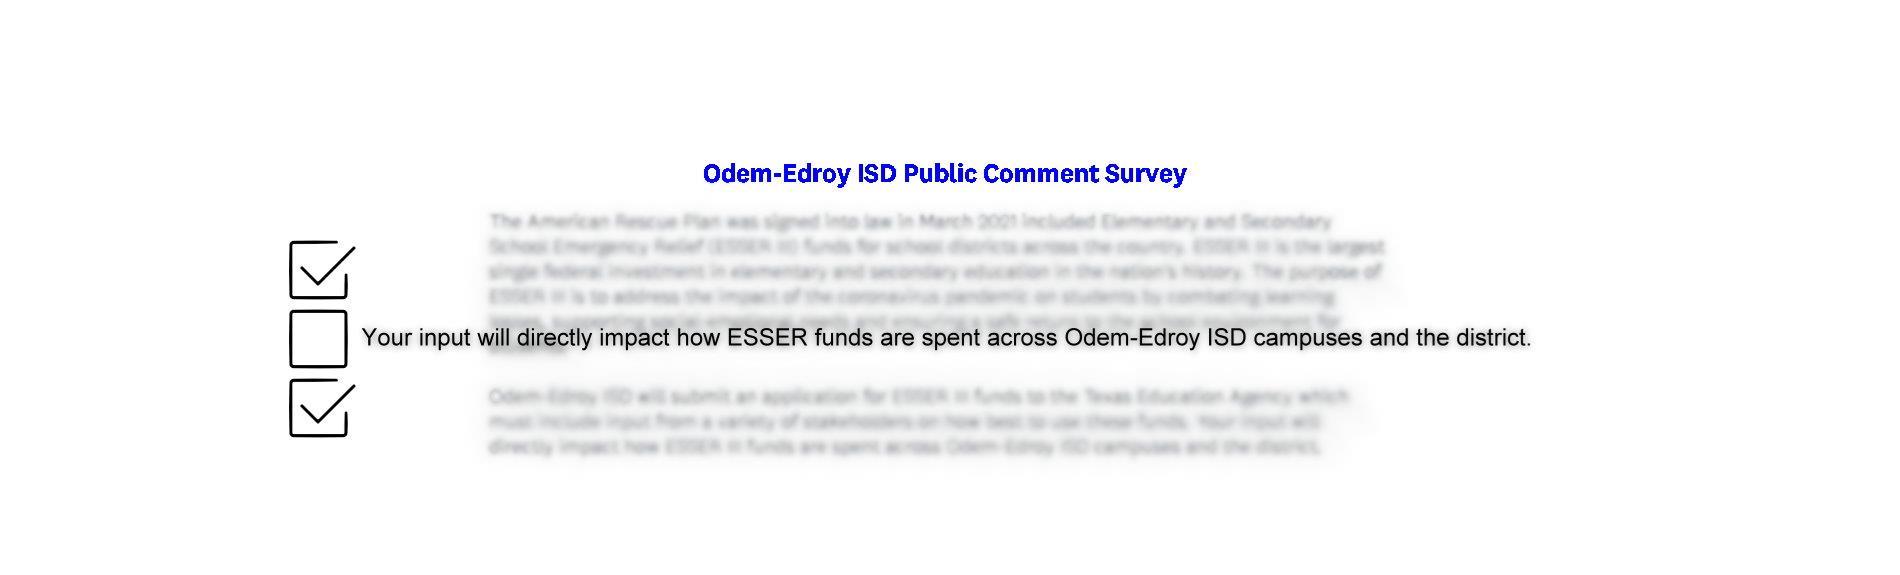 Odem-Edroy ISD Public Comment Survey